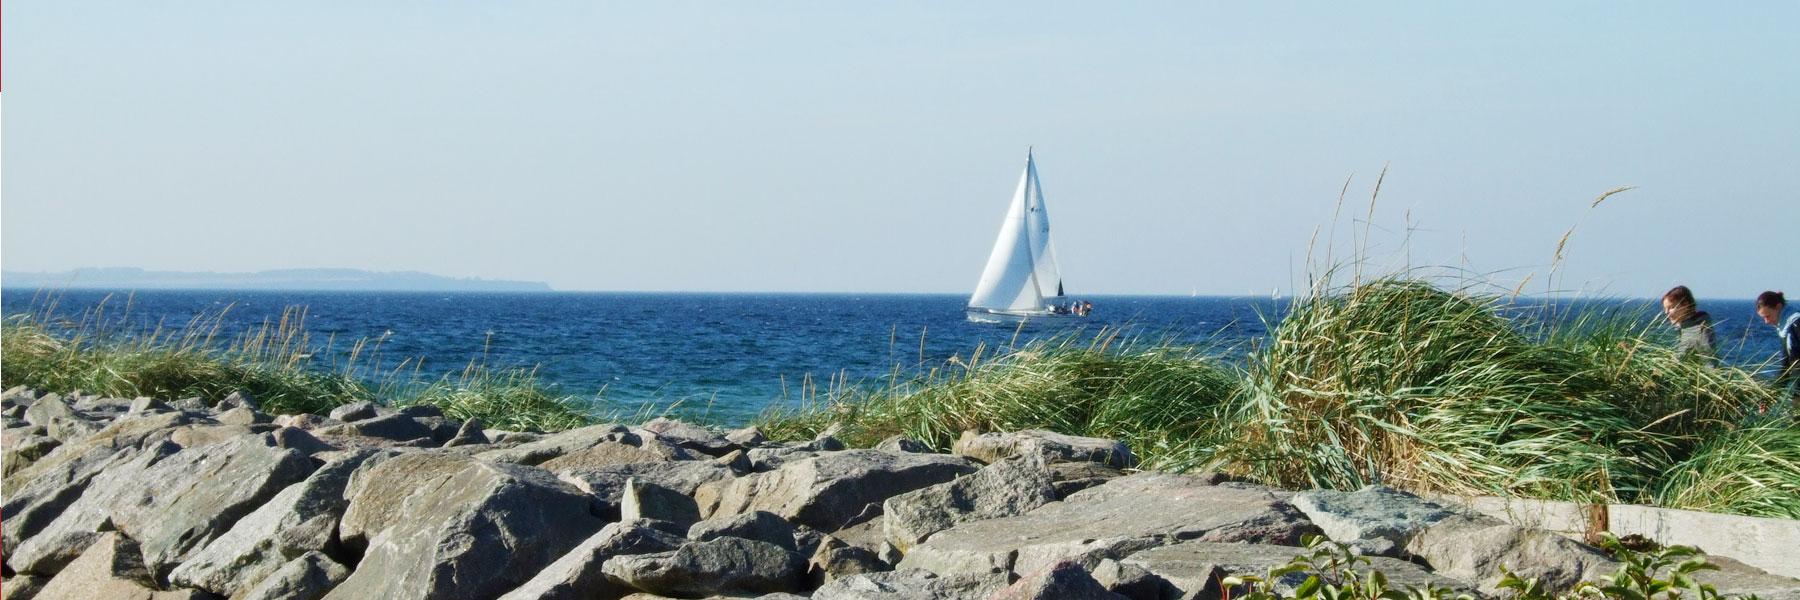 Segelboot - Insel Poel